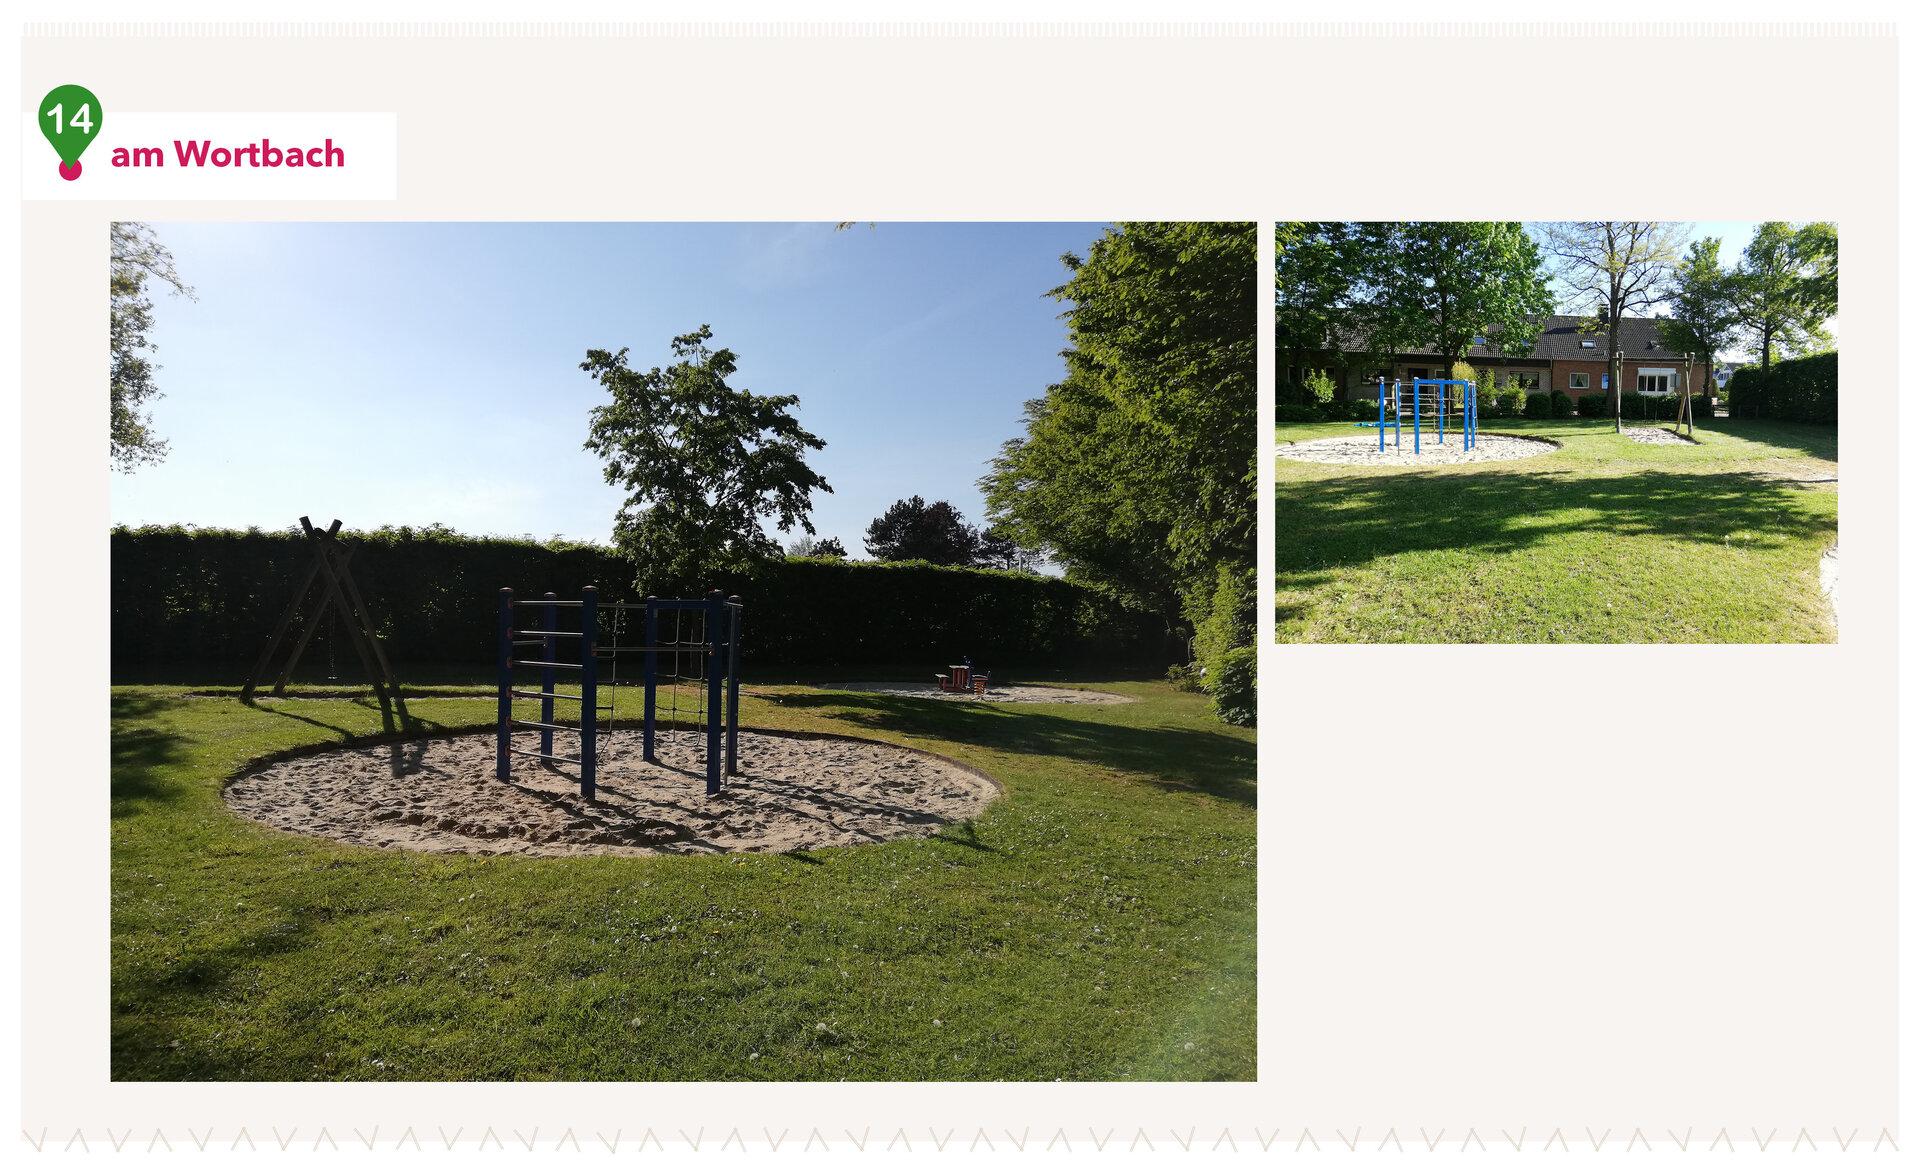 Spielplatz Am Wortbach